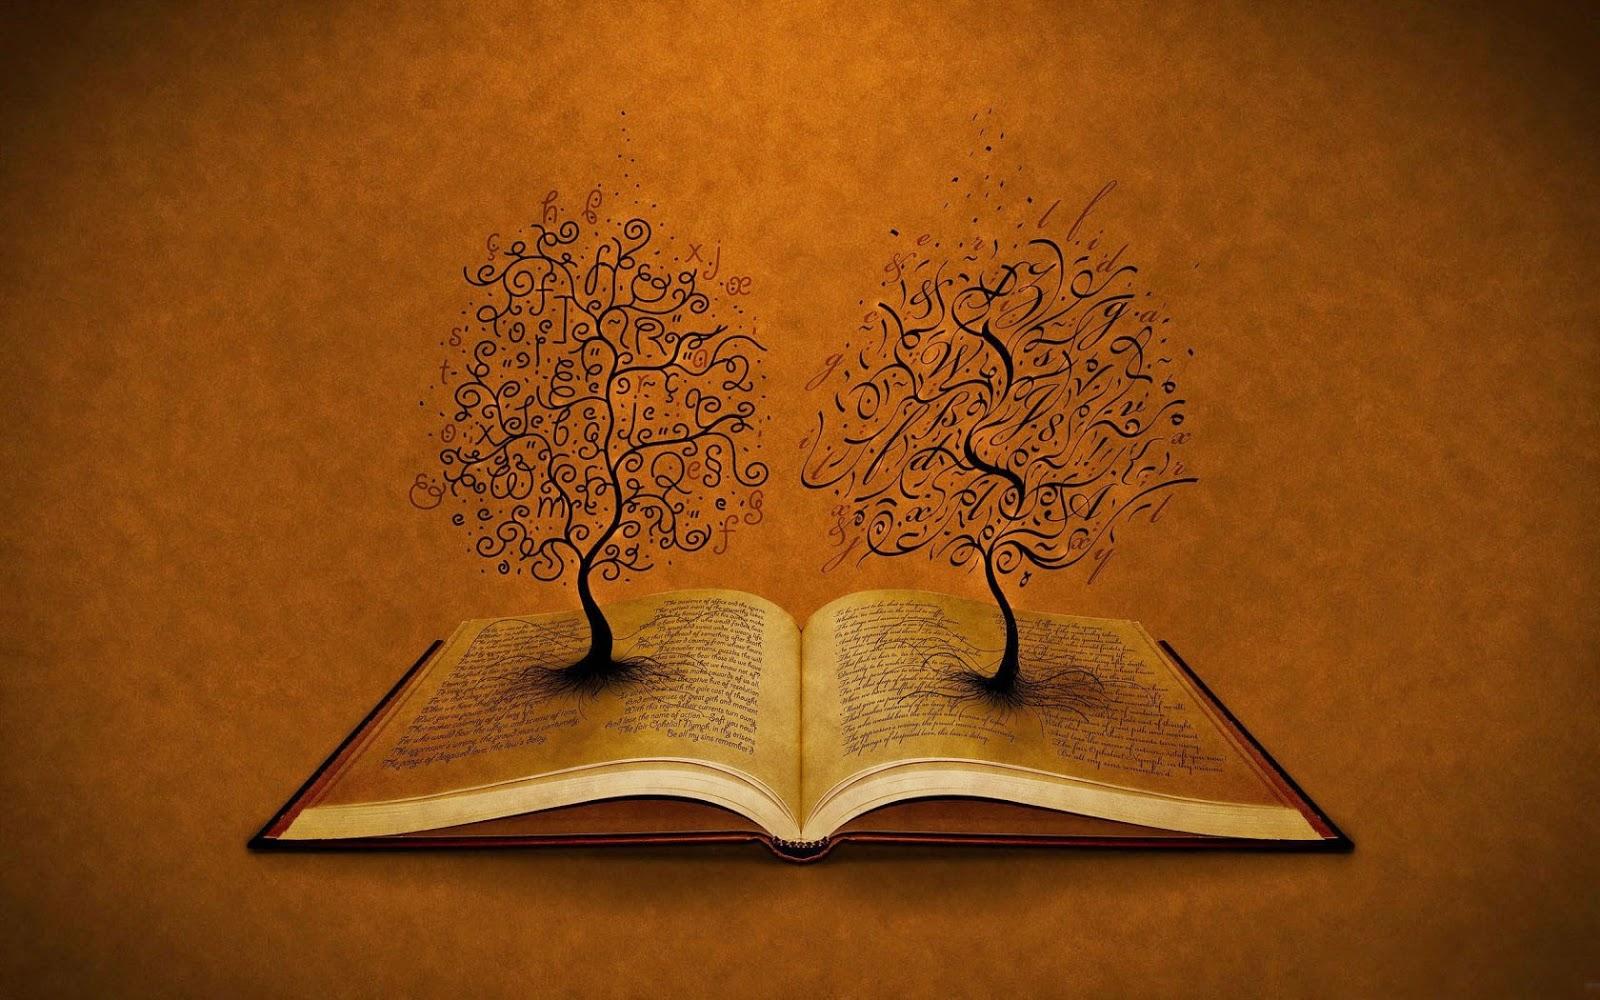 Pedoman Transileterasi Latin Arab Dalam Penulisan Nama Tokoh Daerah